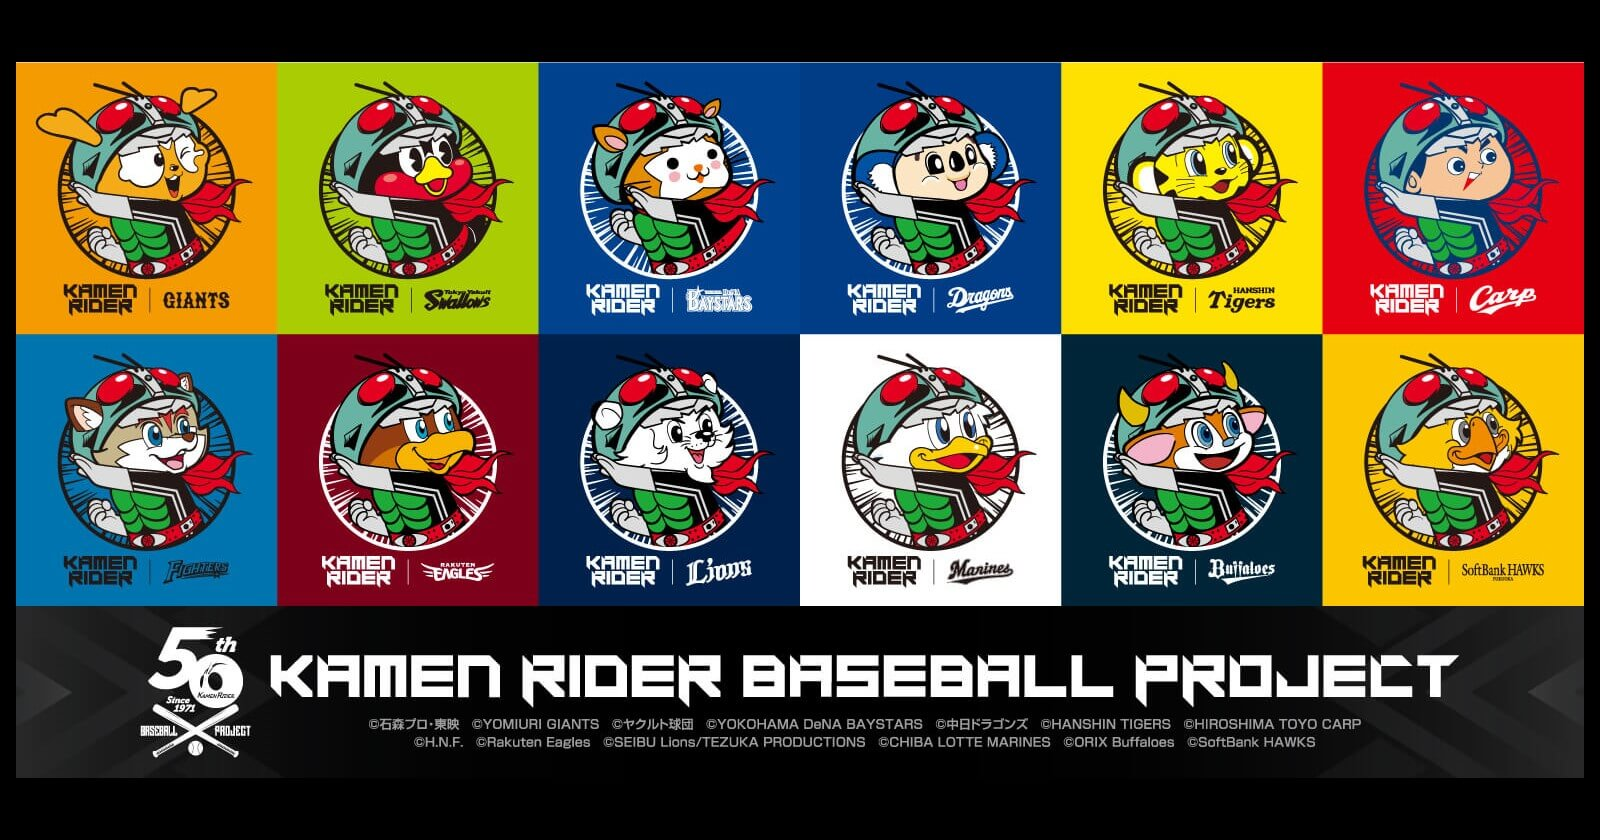 KAMEN RIDER BASEBALL PROJECT始動! image